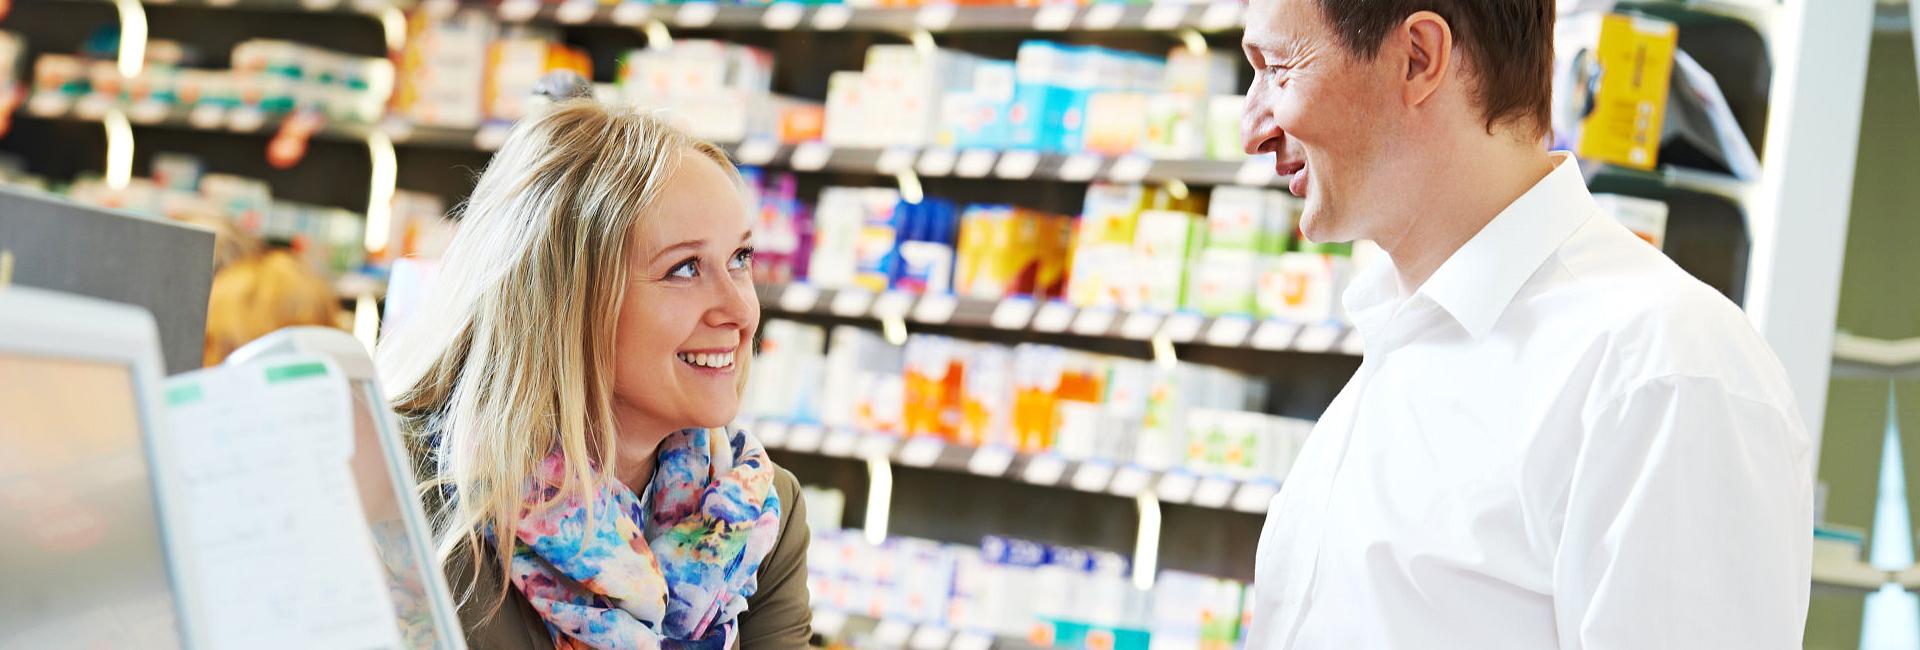 pharmacist assisting a customer